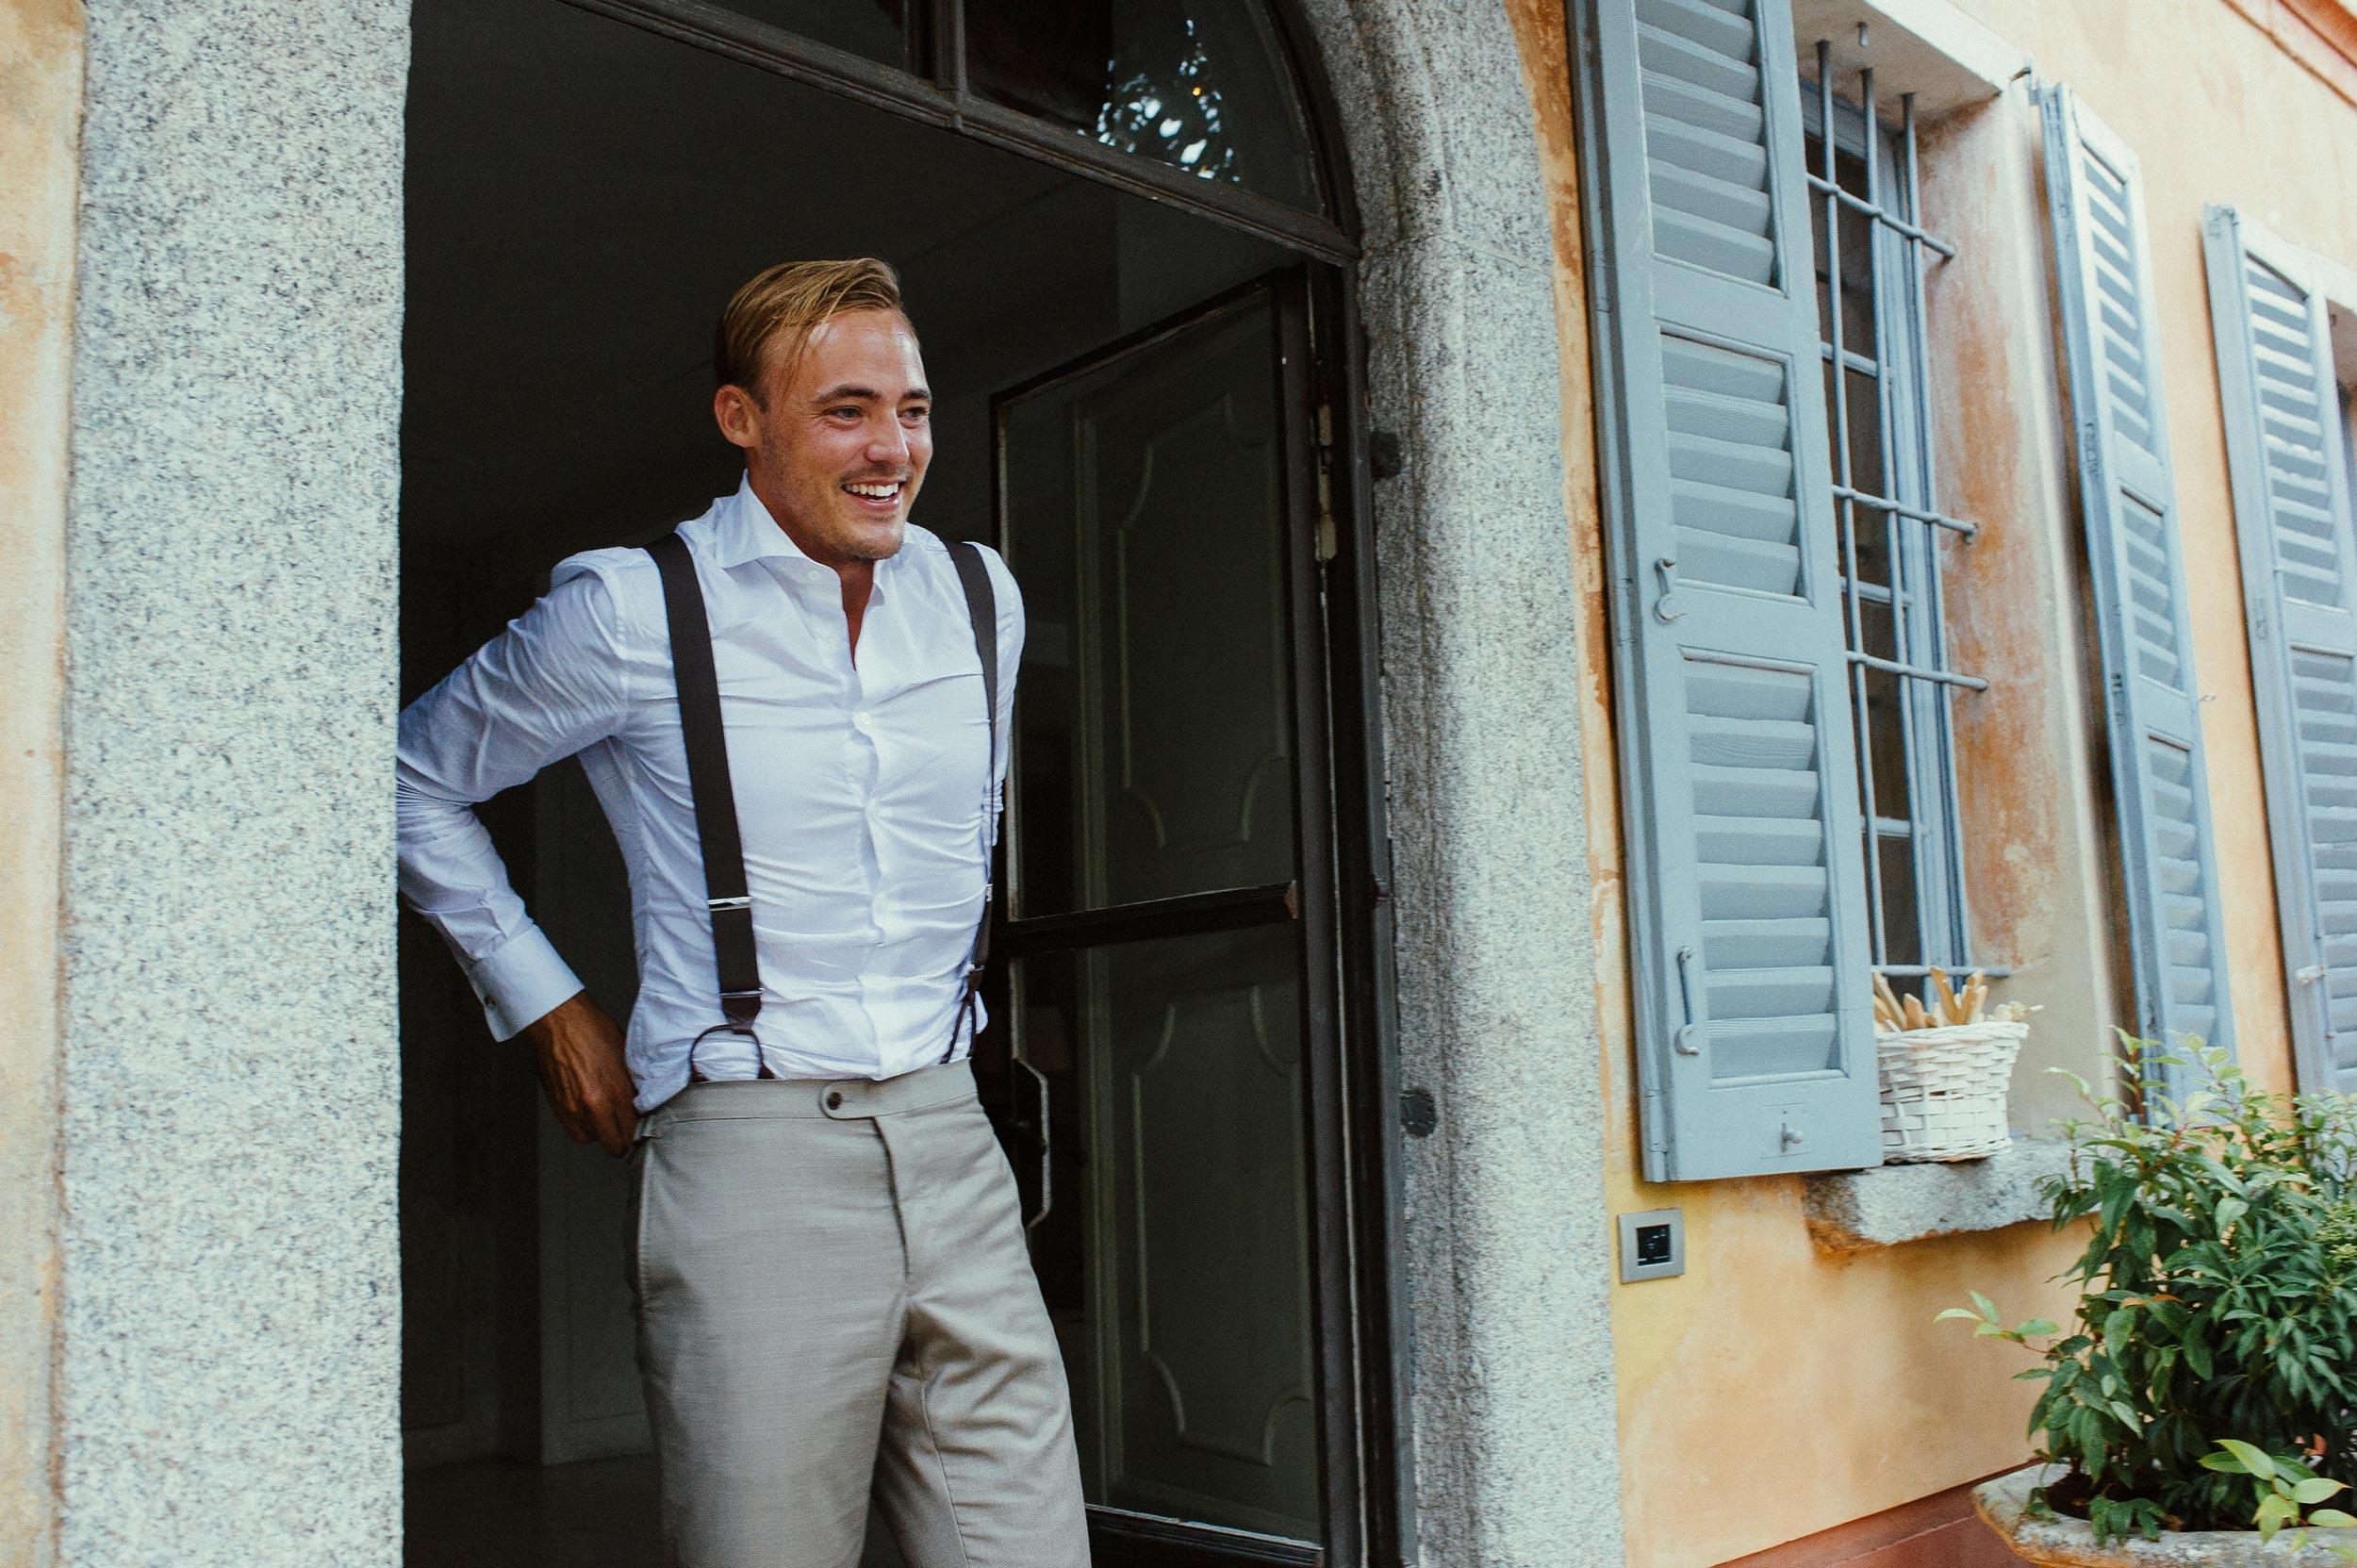 2018-Villa-Regina-Teodolinda-Lake-Como-Wedding-Photographer-Italy-Alessandro-Avenali-271.jpg